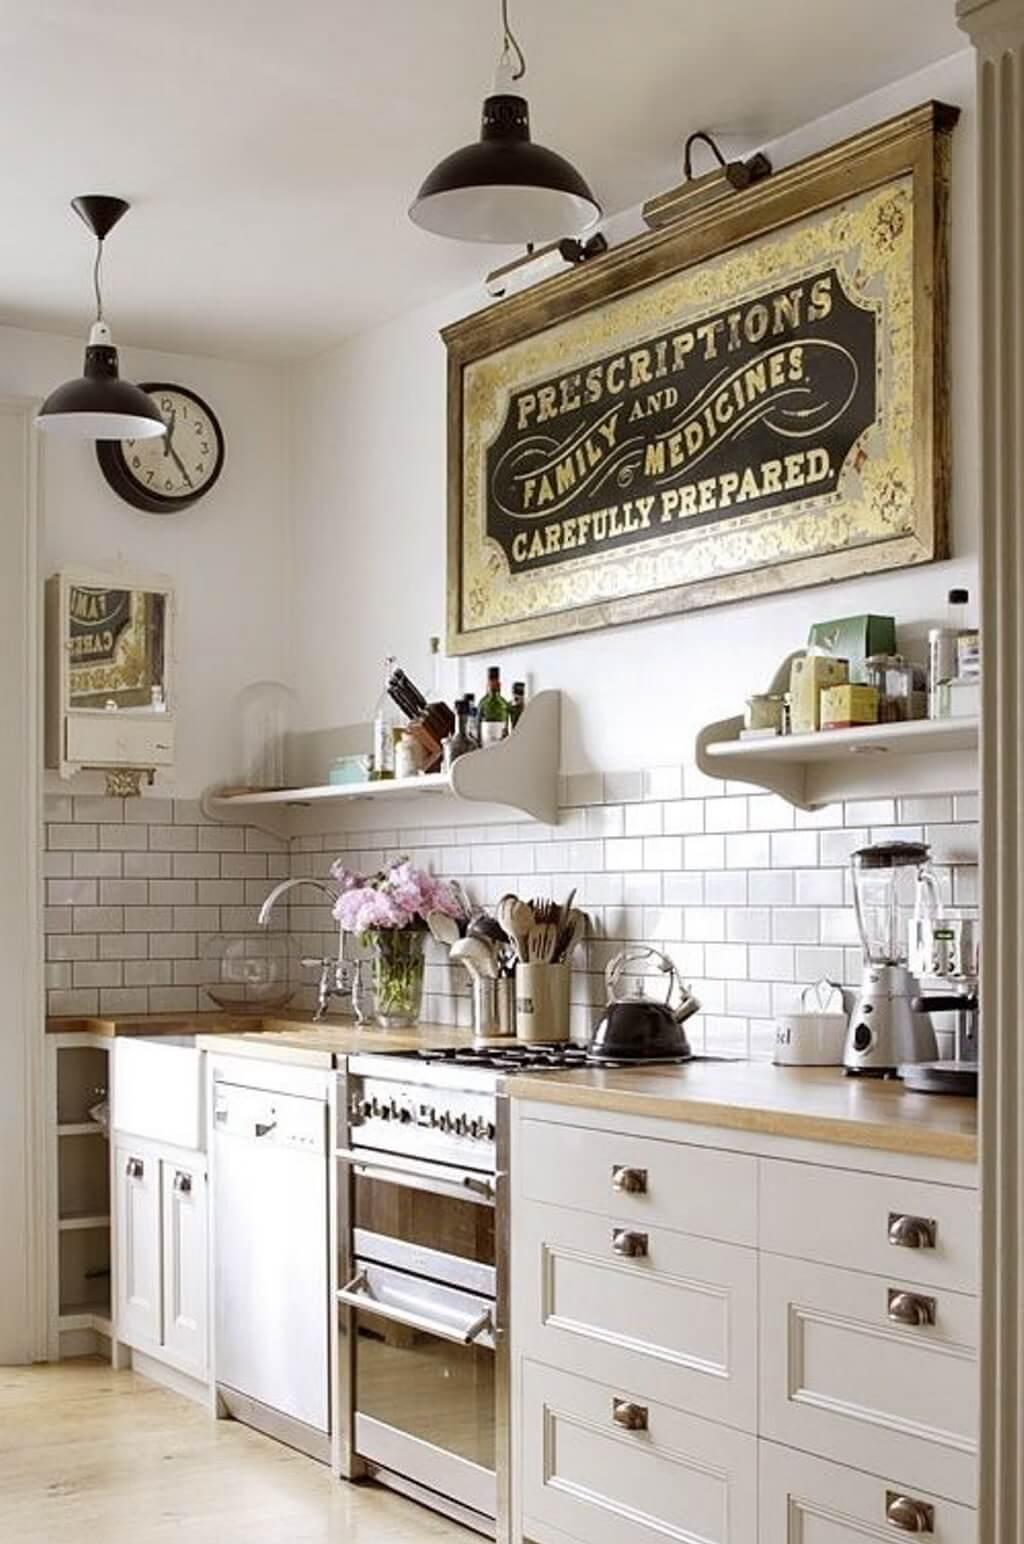 Una cucina stile Vintage! Date un\'occhiata a queste 20 bellissime ...